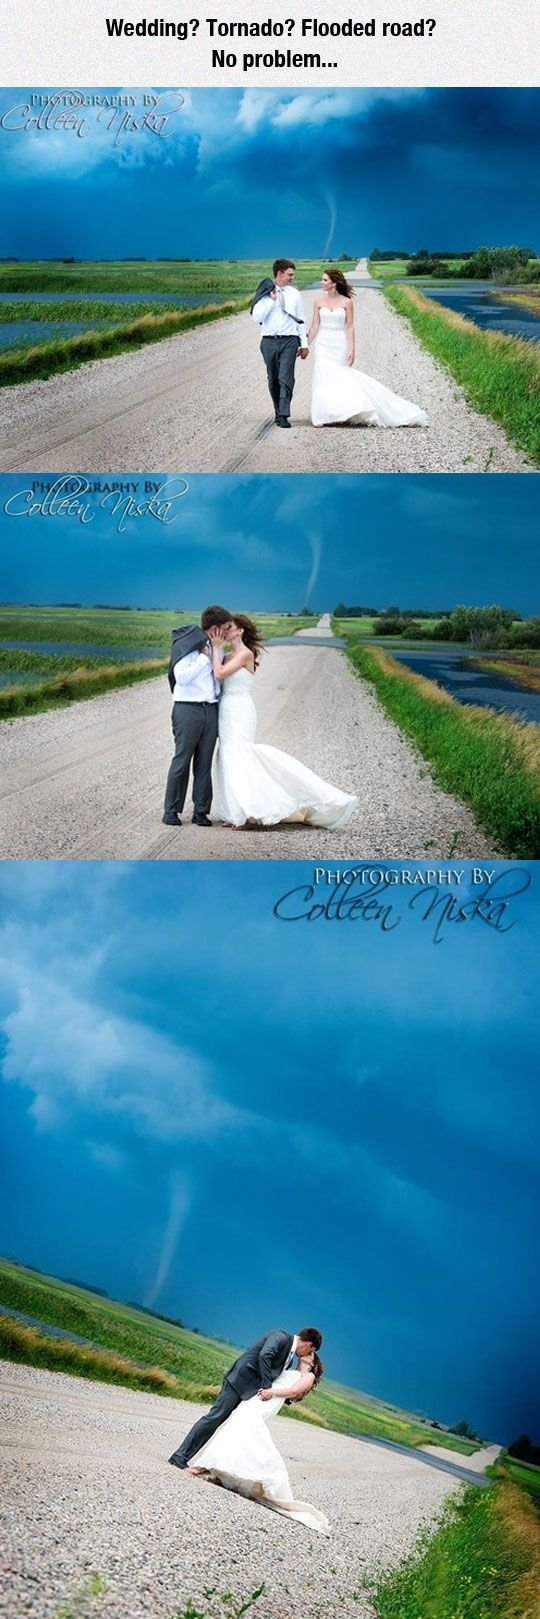 The Most Amazing Wedding Photo-Shoot Ever